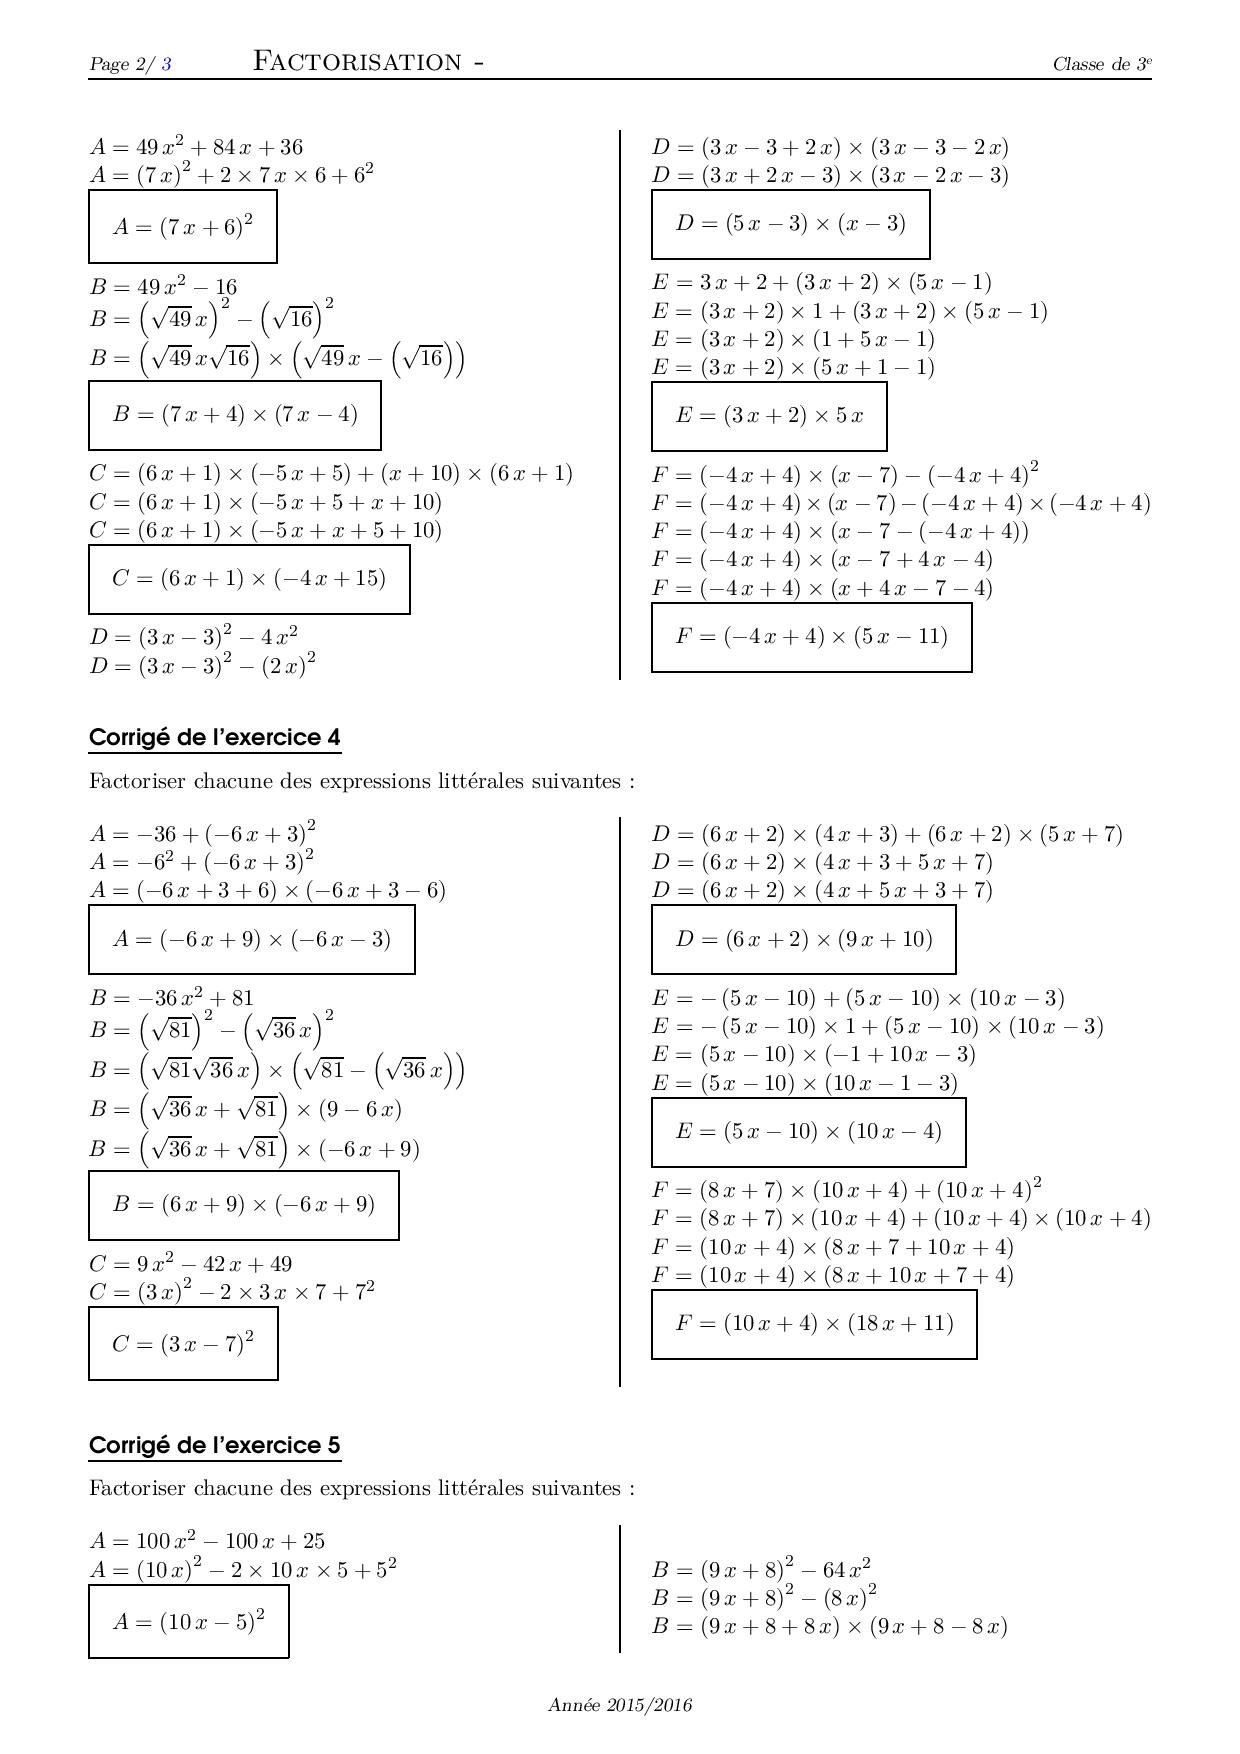 Factorisation - Corrigé série d'exercices 4 - AlloSchool